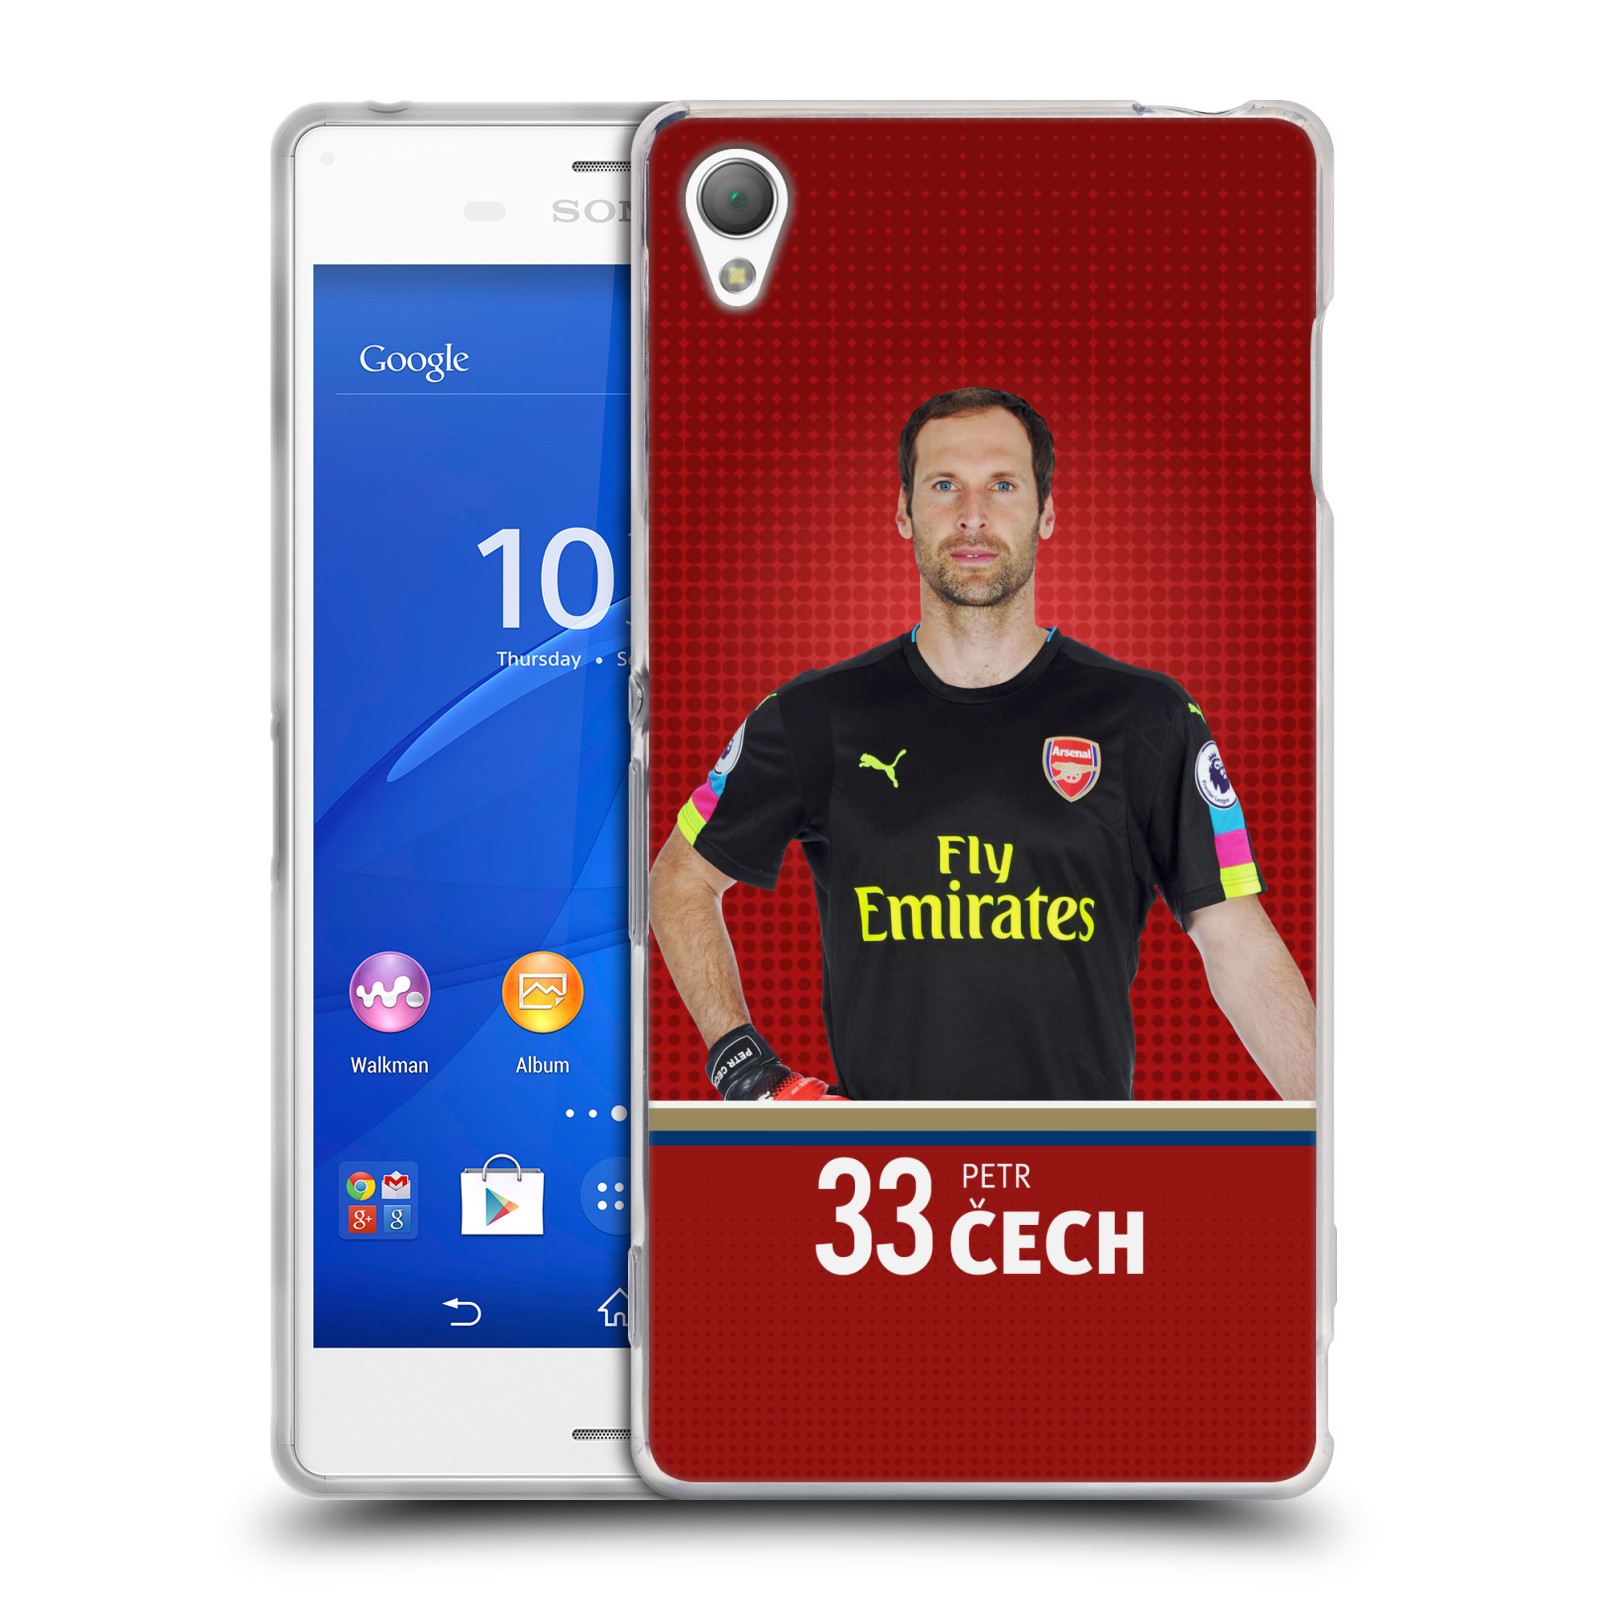 Silikonové pouzdro na mobil Sony Xperia Z3 D6603 - Head Case - Arsenal FC - Petr Čech